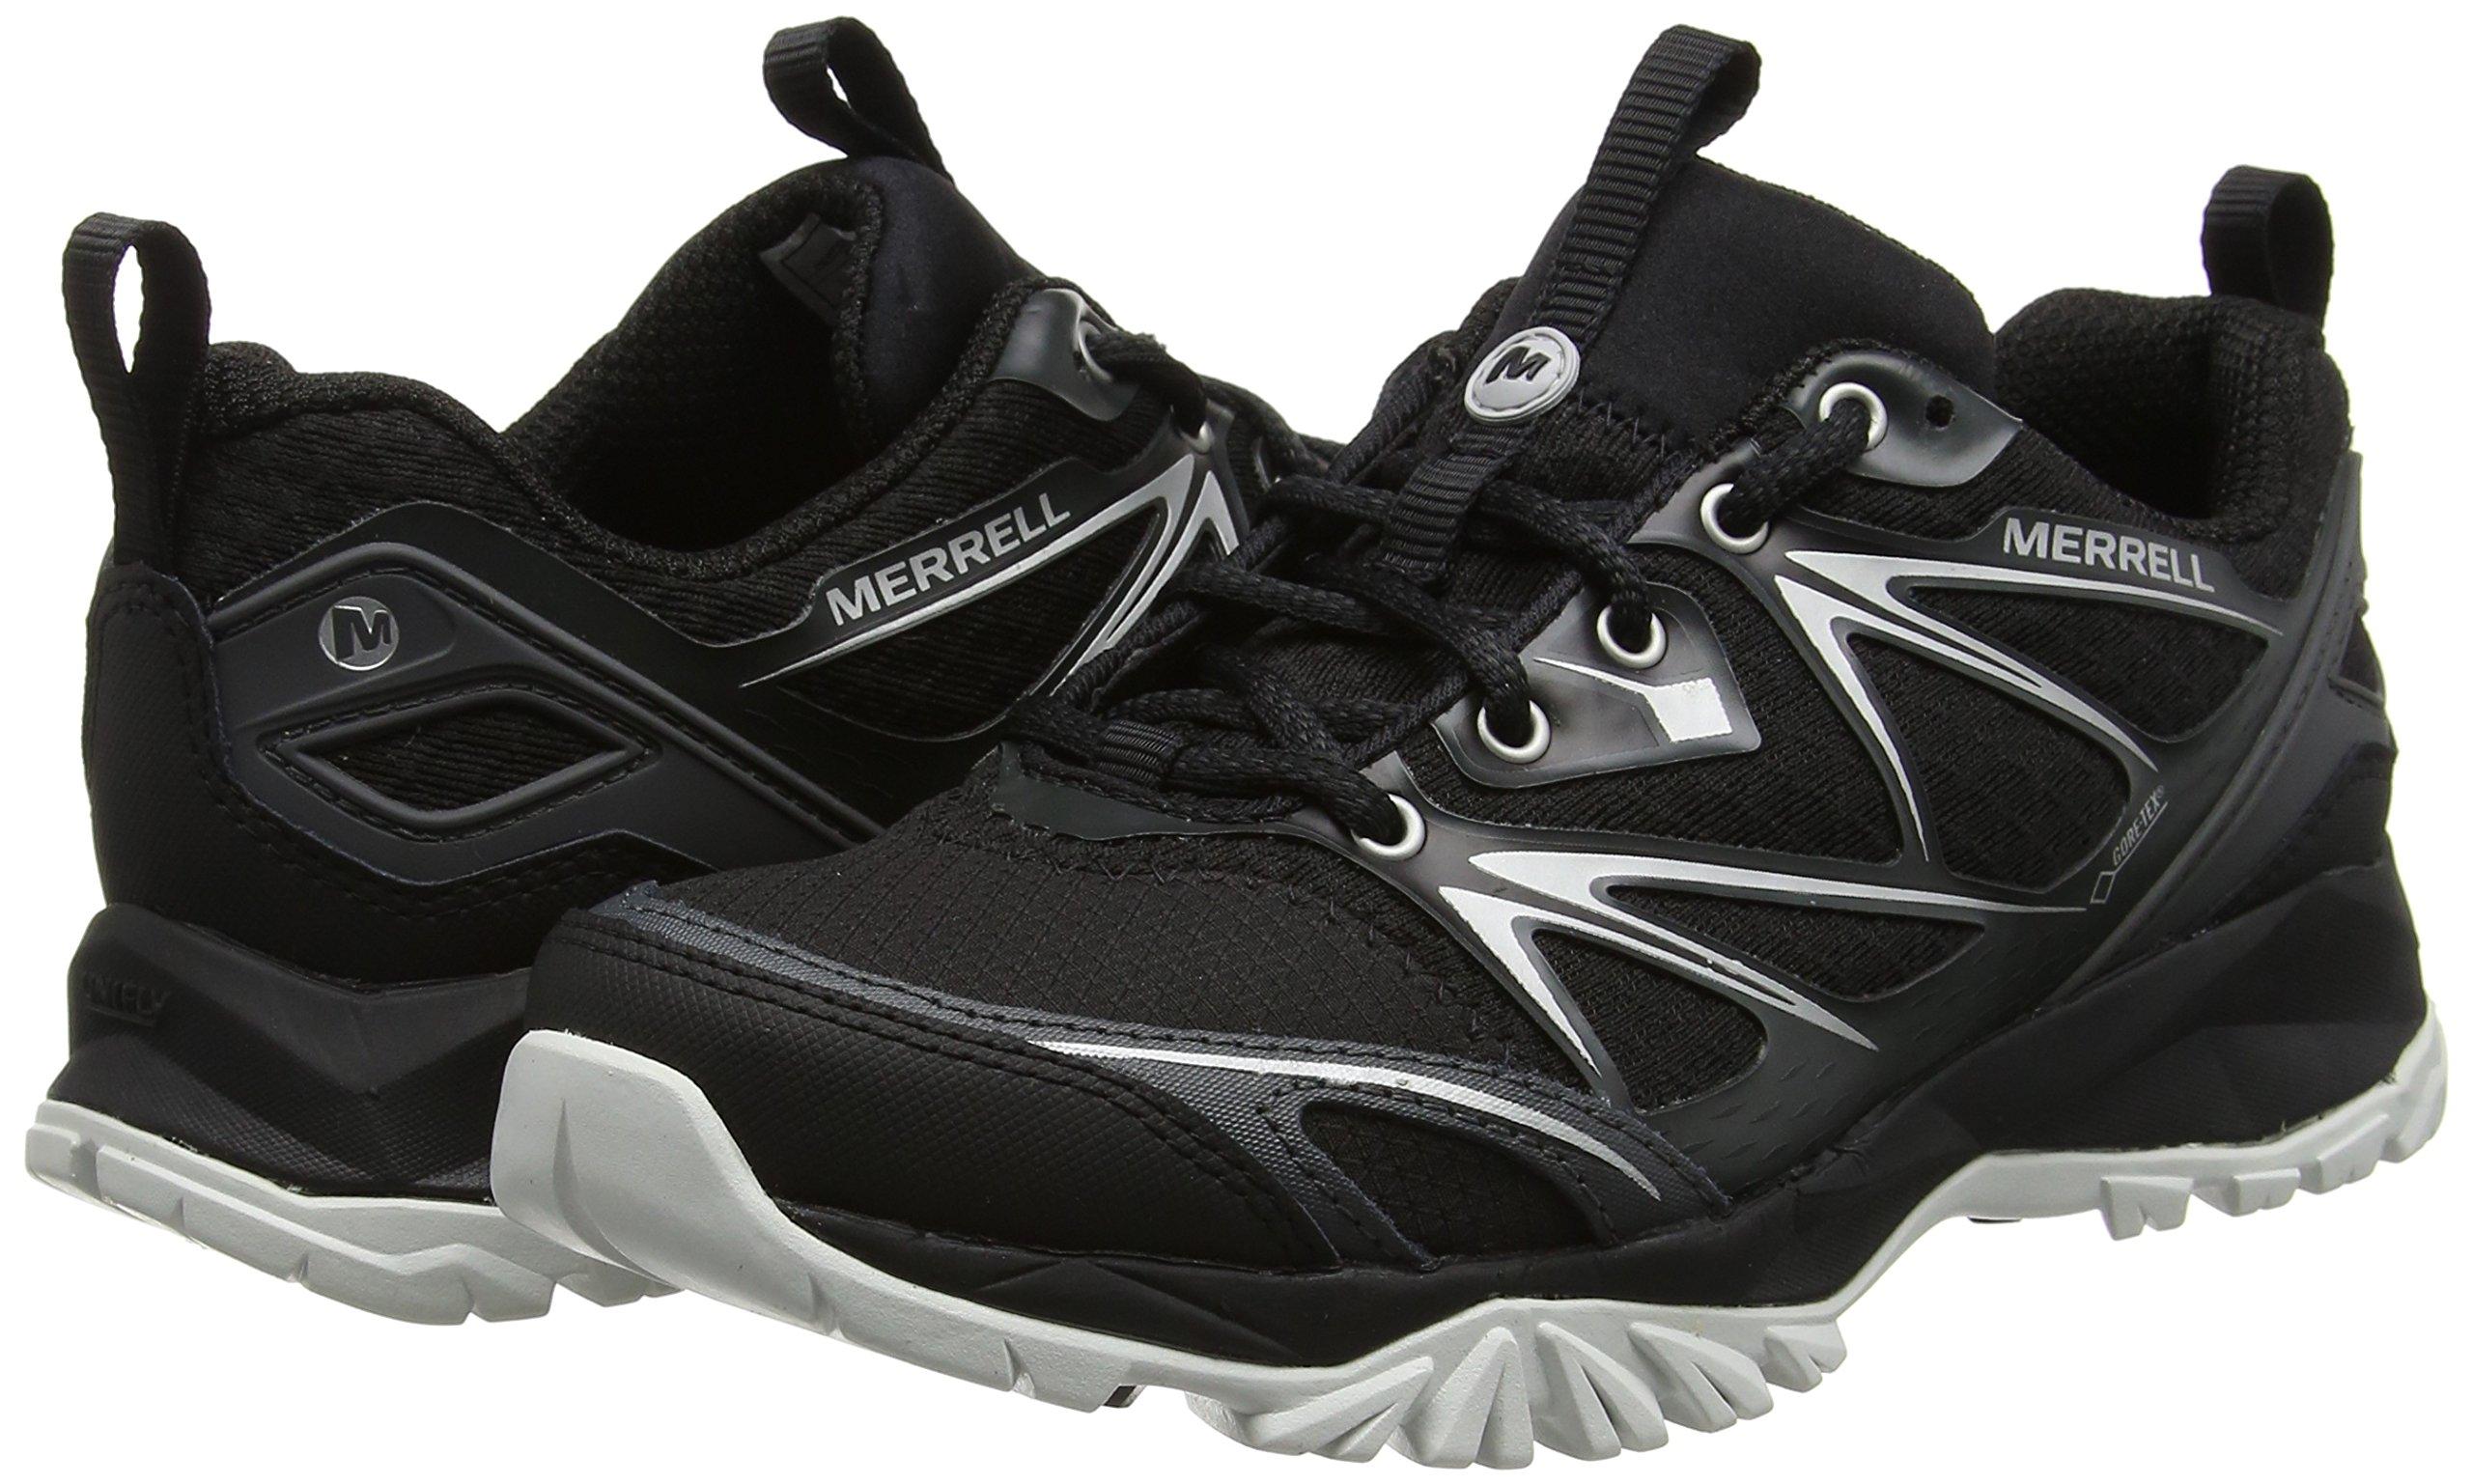 Merrell Women Capra Bolt GTX Low Rise Hiking Shoes